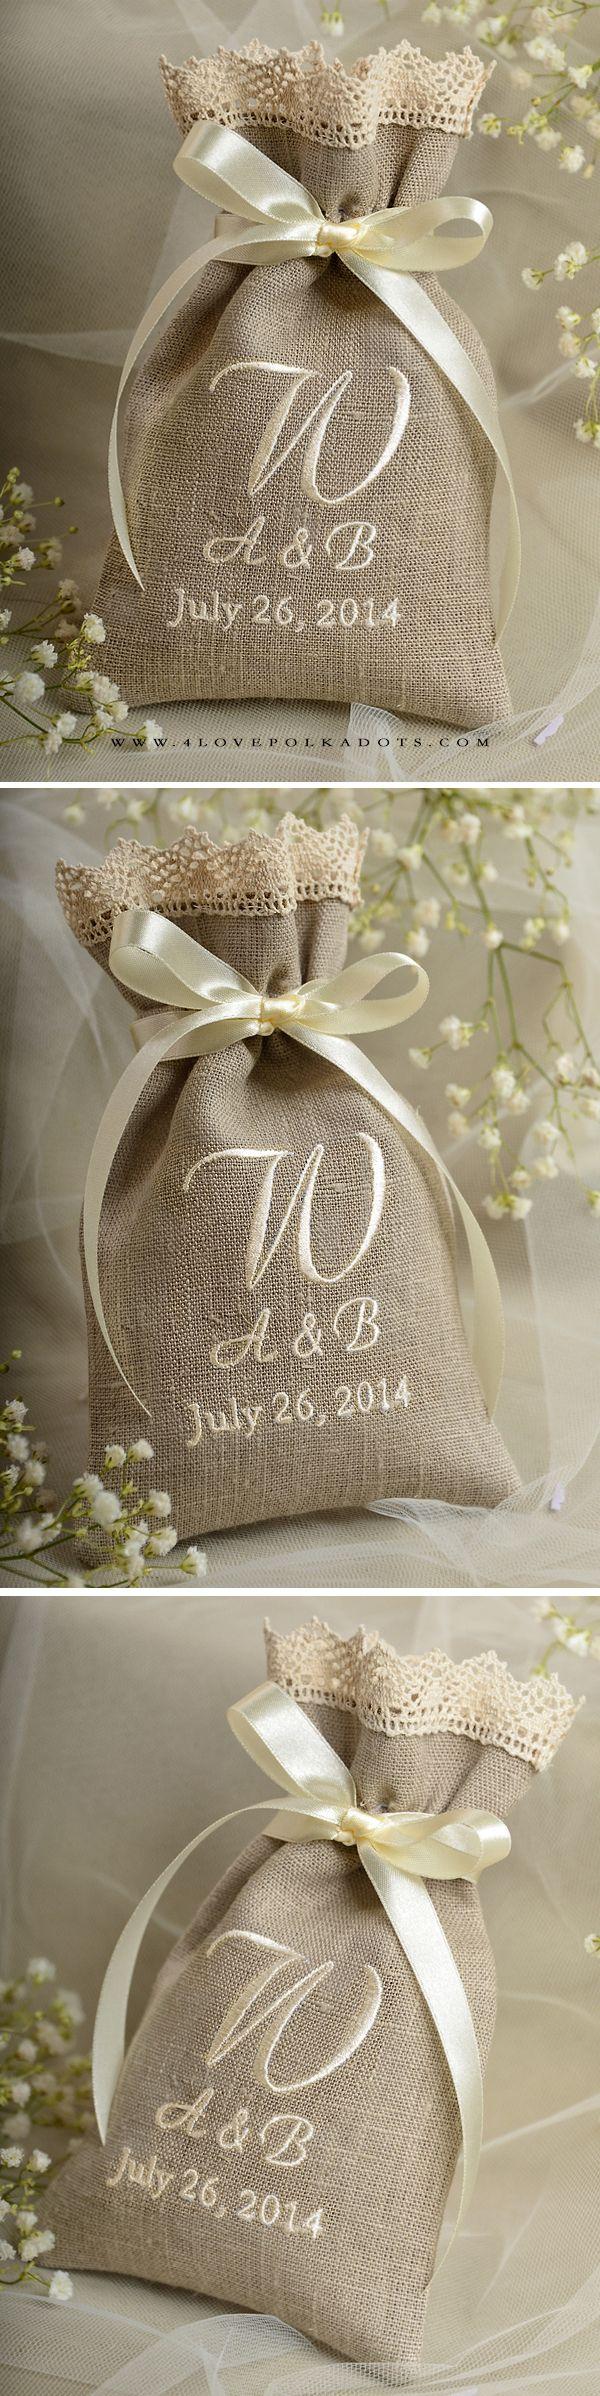 Best 25 Wedding Souvenir Ideas On Pinterest Rustic Books Wood